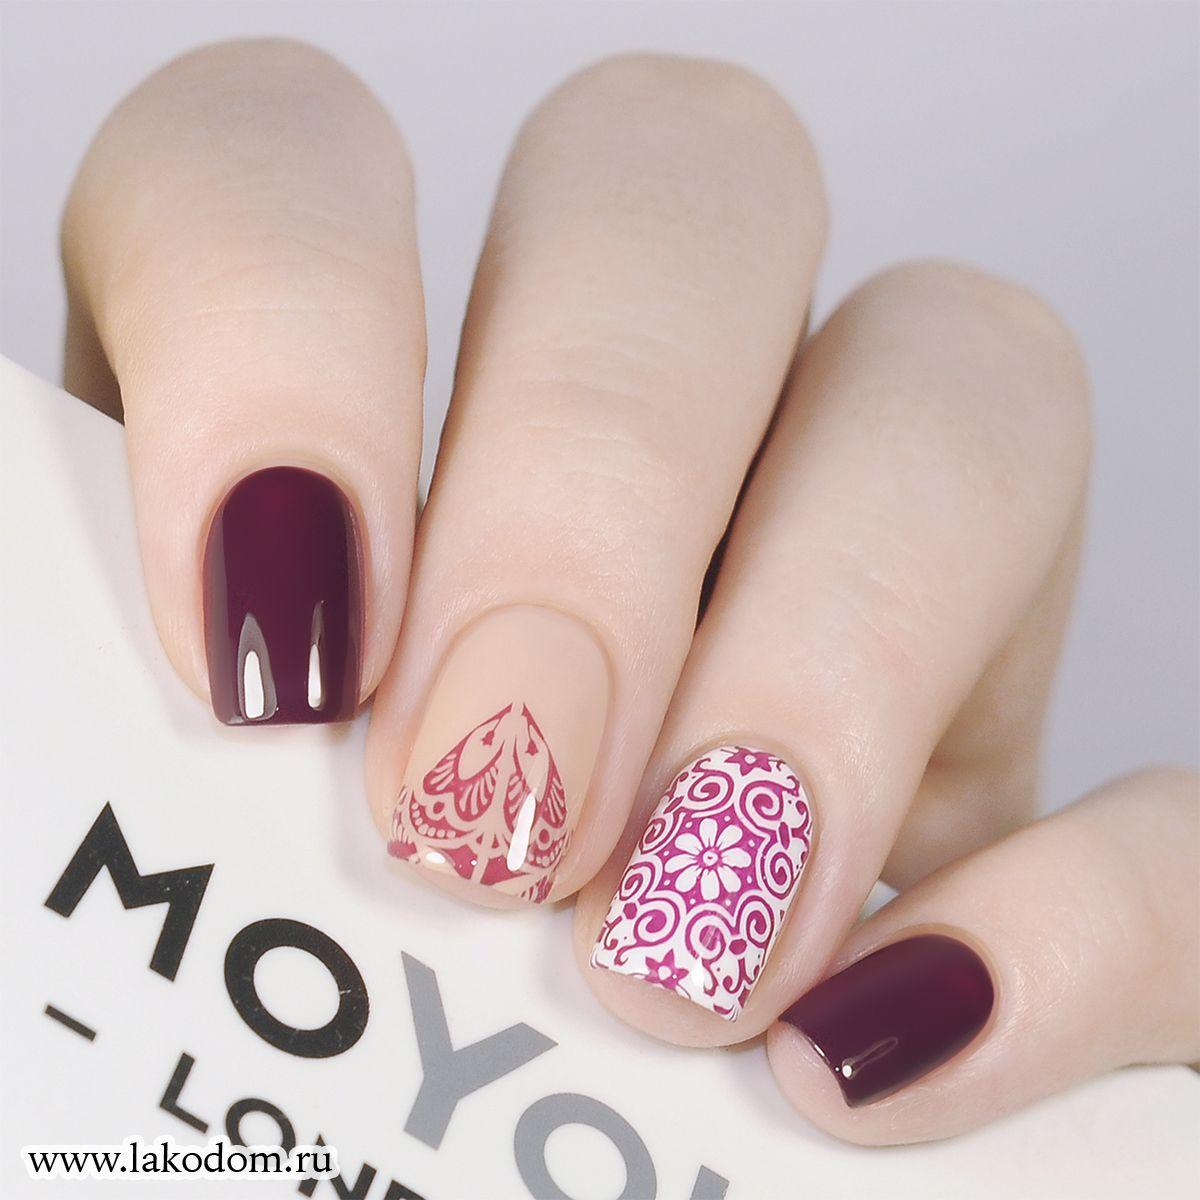 Moyou london flower power 14 uas pinterest flower power beauty nails moyou london flower power 14 izmirmasajfo